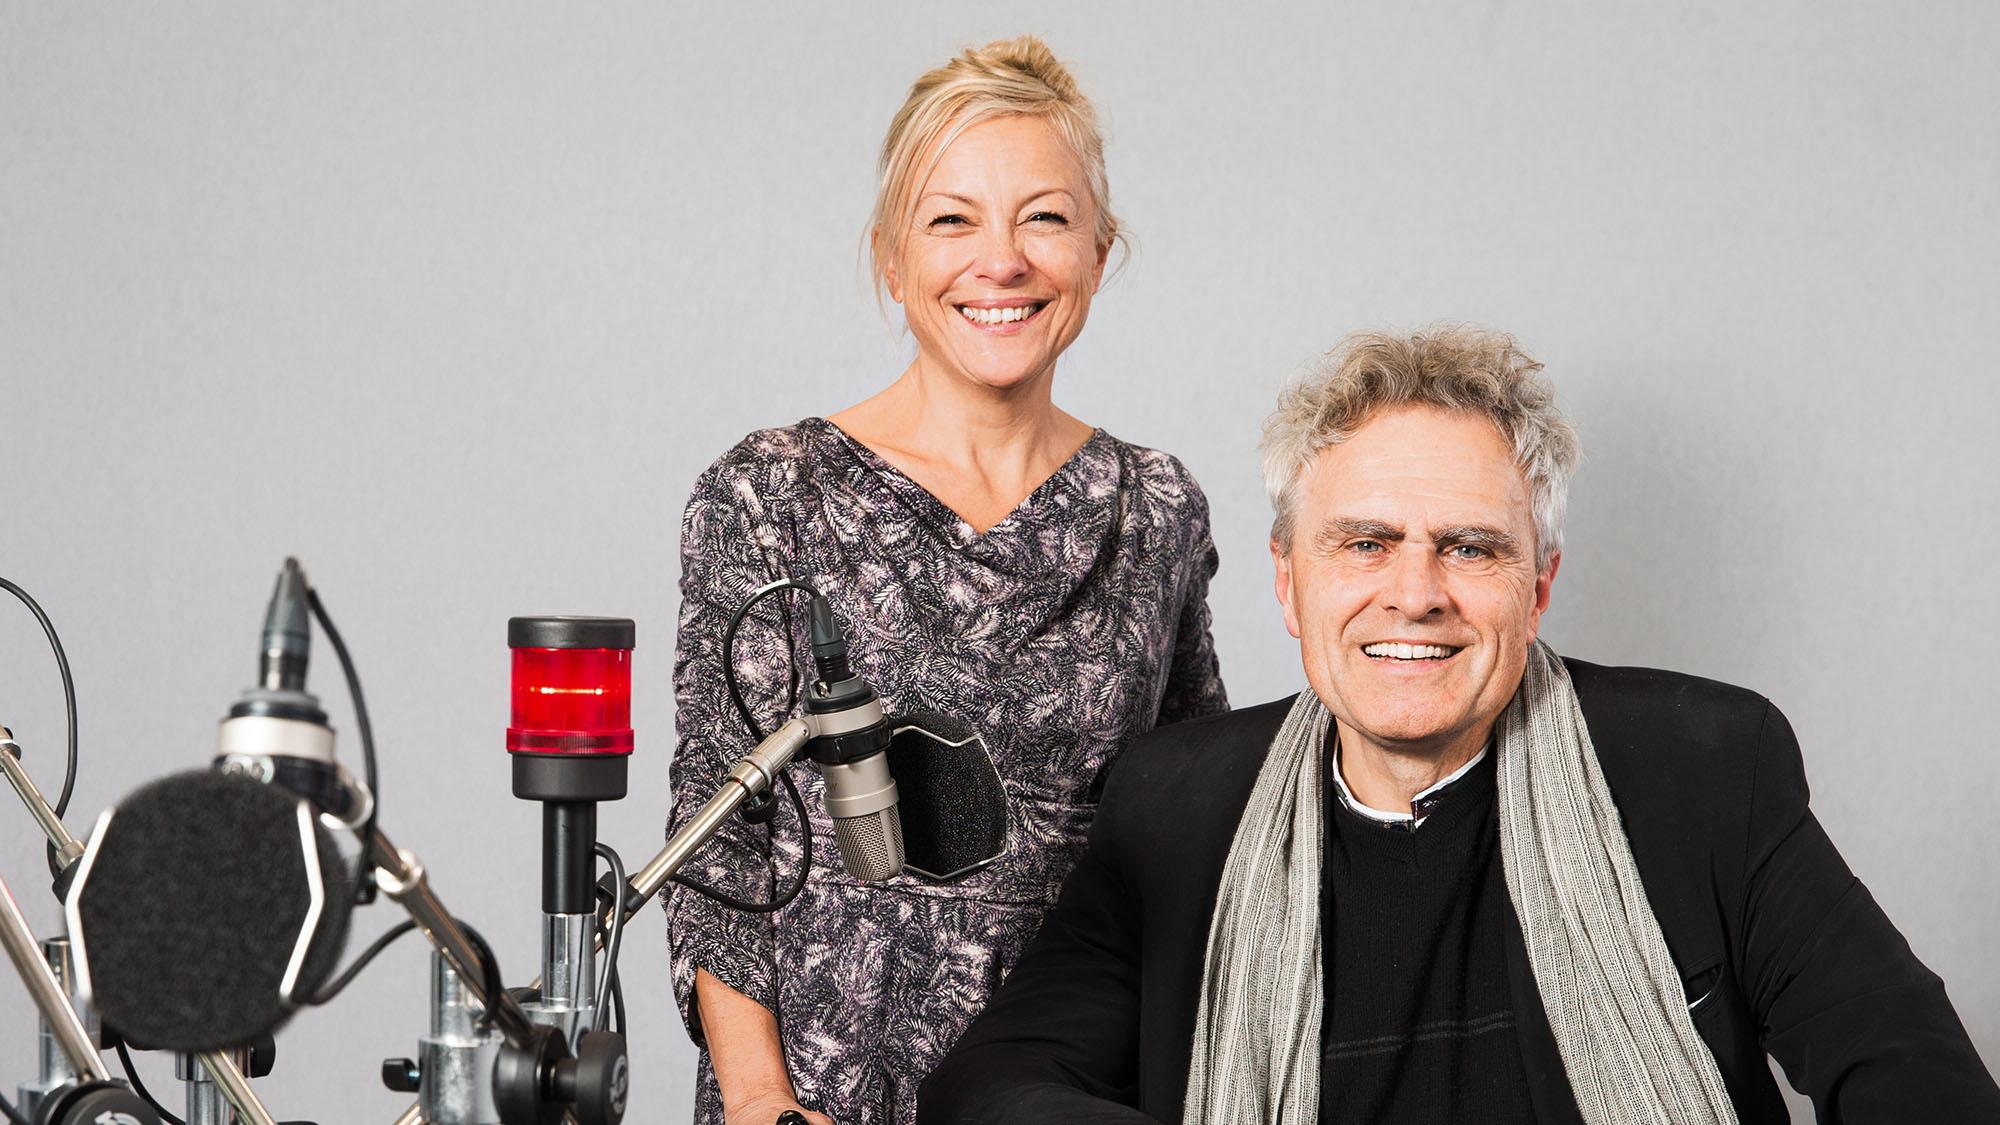 Brigitte Raul et Eörs Kisfaludy (© SRF Severin Nowacki)